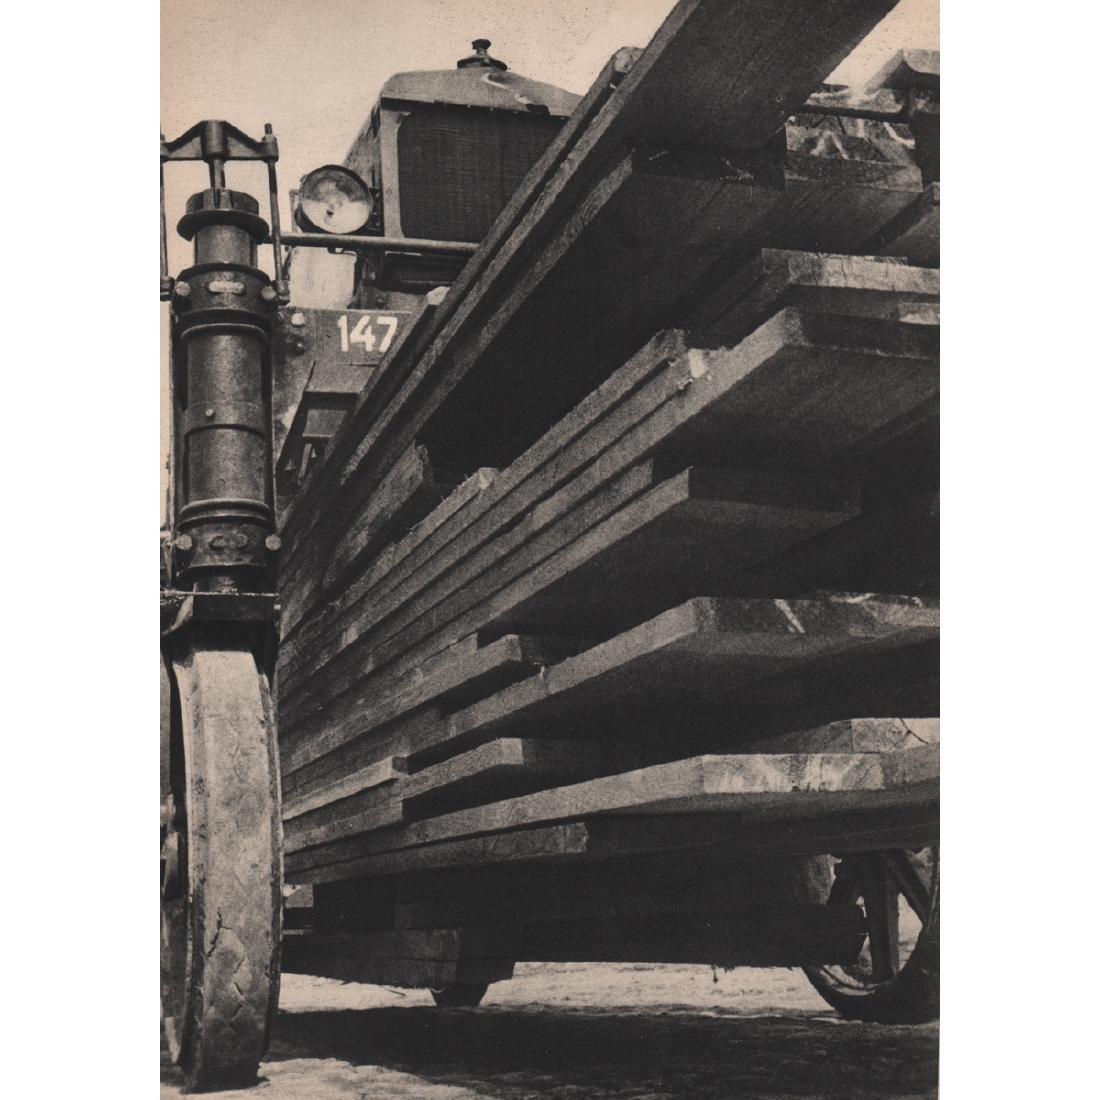 BORIS IGNATOVITCH - Lumber Transport